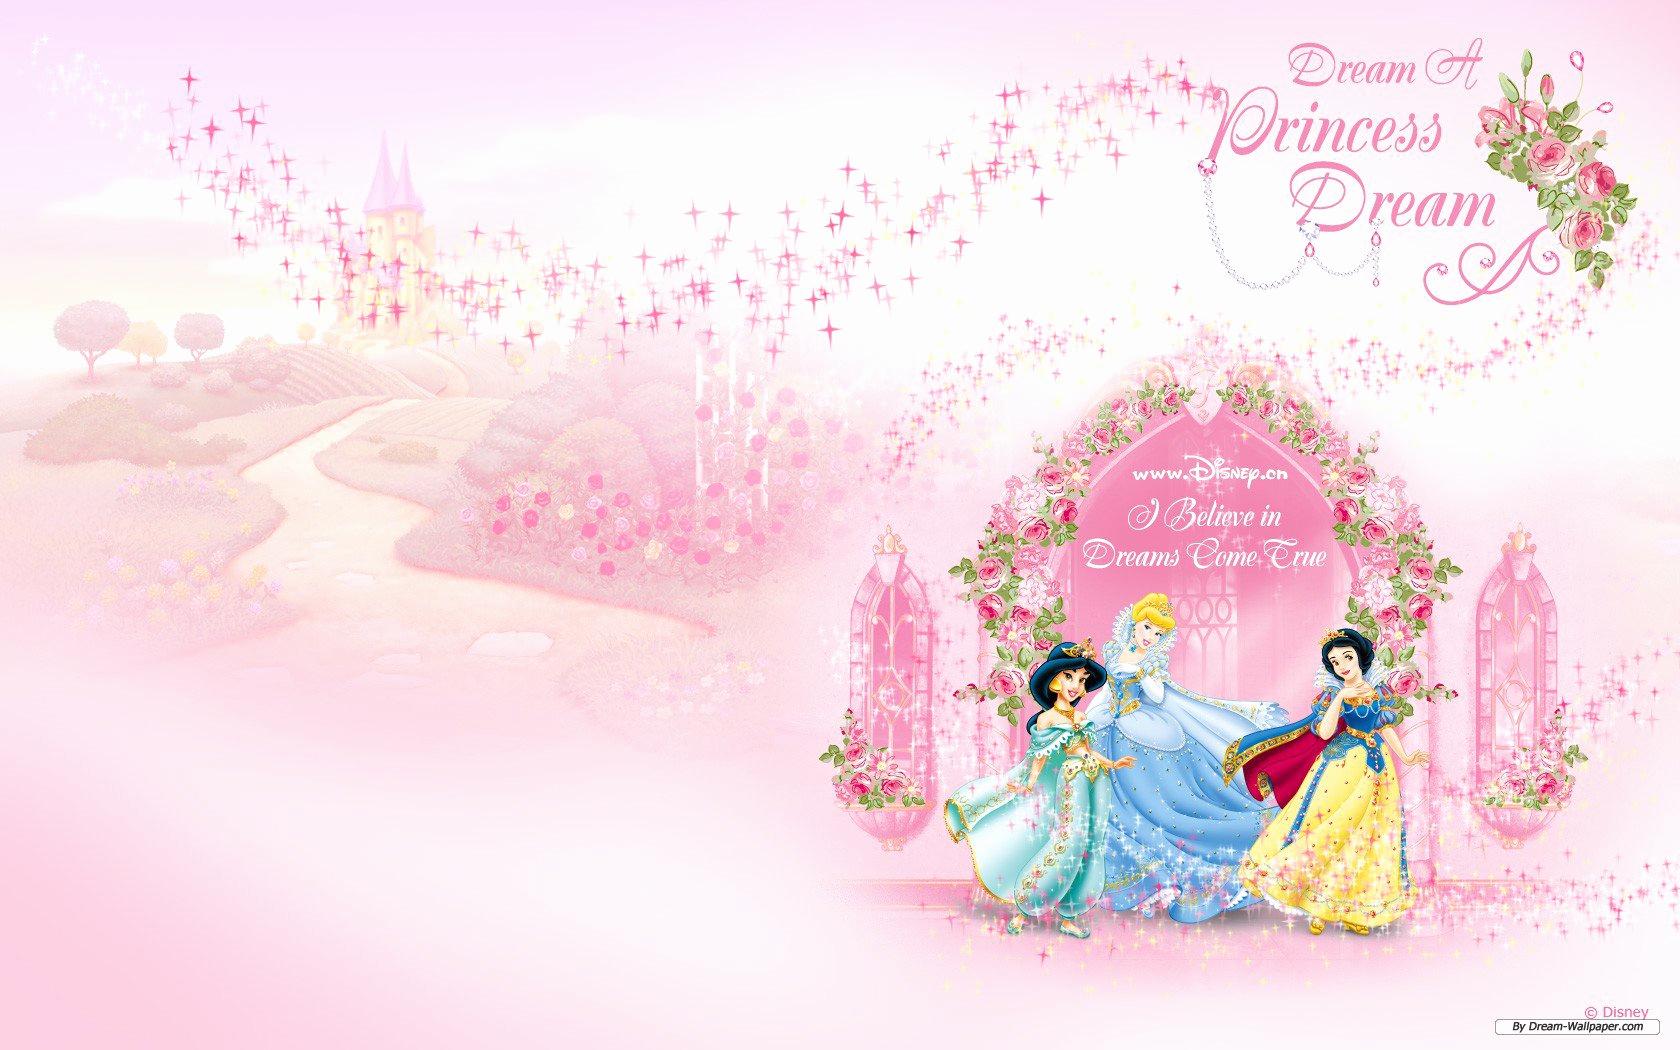 Disney Princess Invitation Templates Free Unique Disney Princess Invitation Templates Free